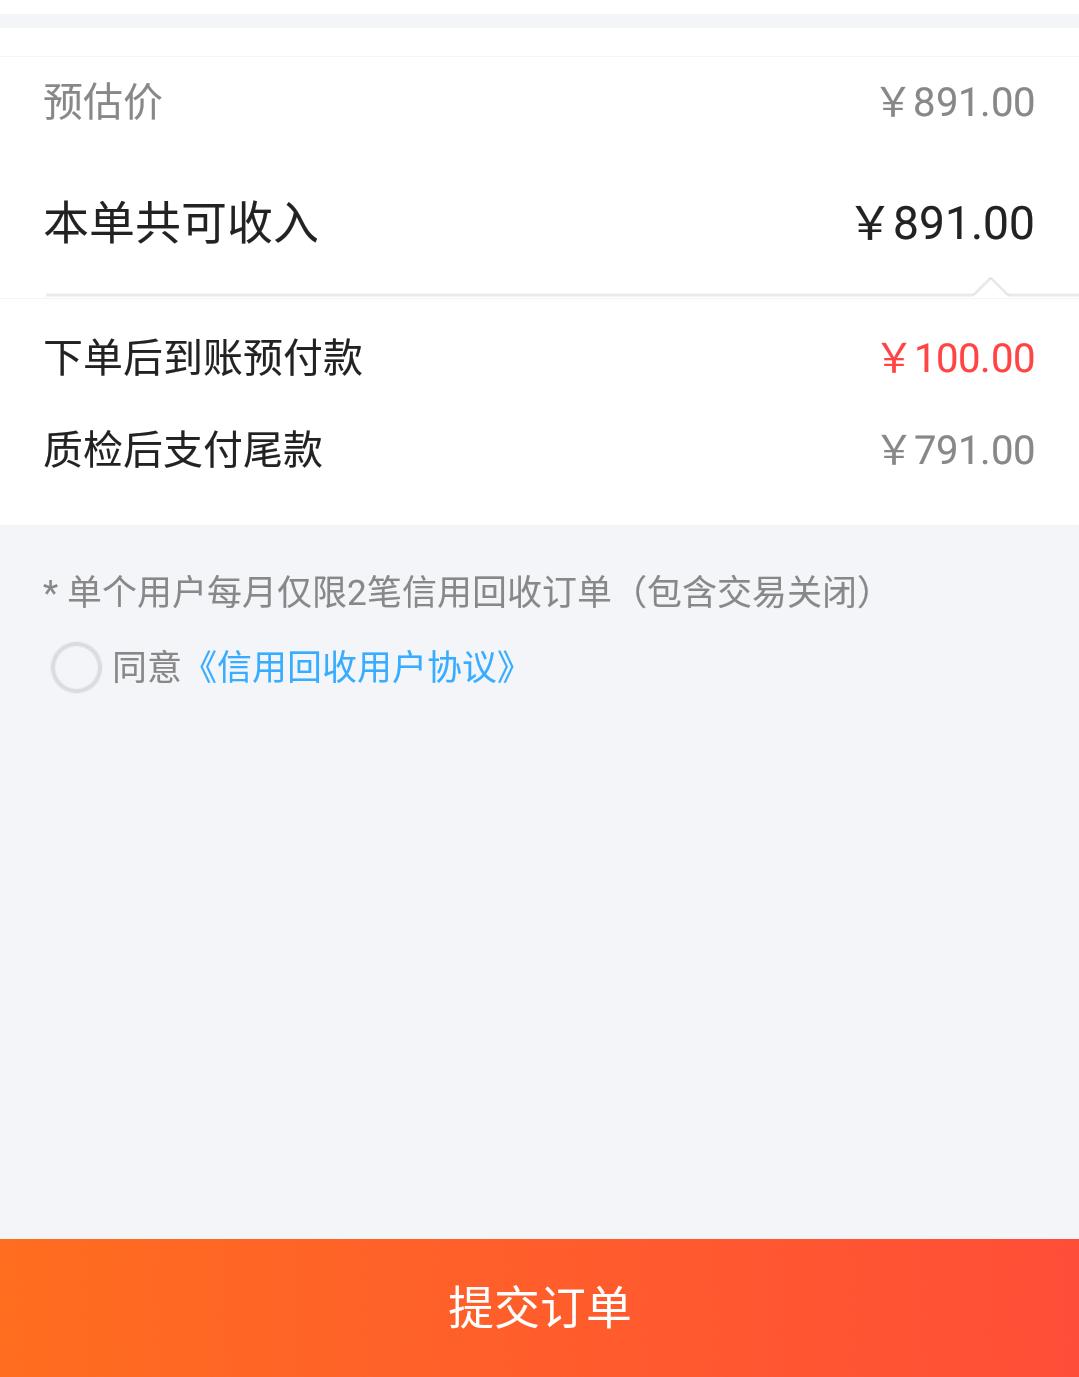 Screenshot_2019-09-08-10-01-23.png